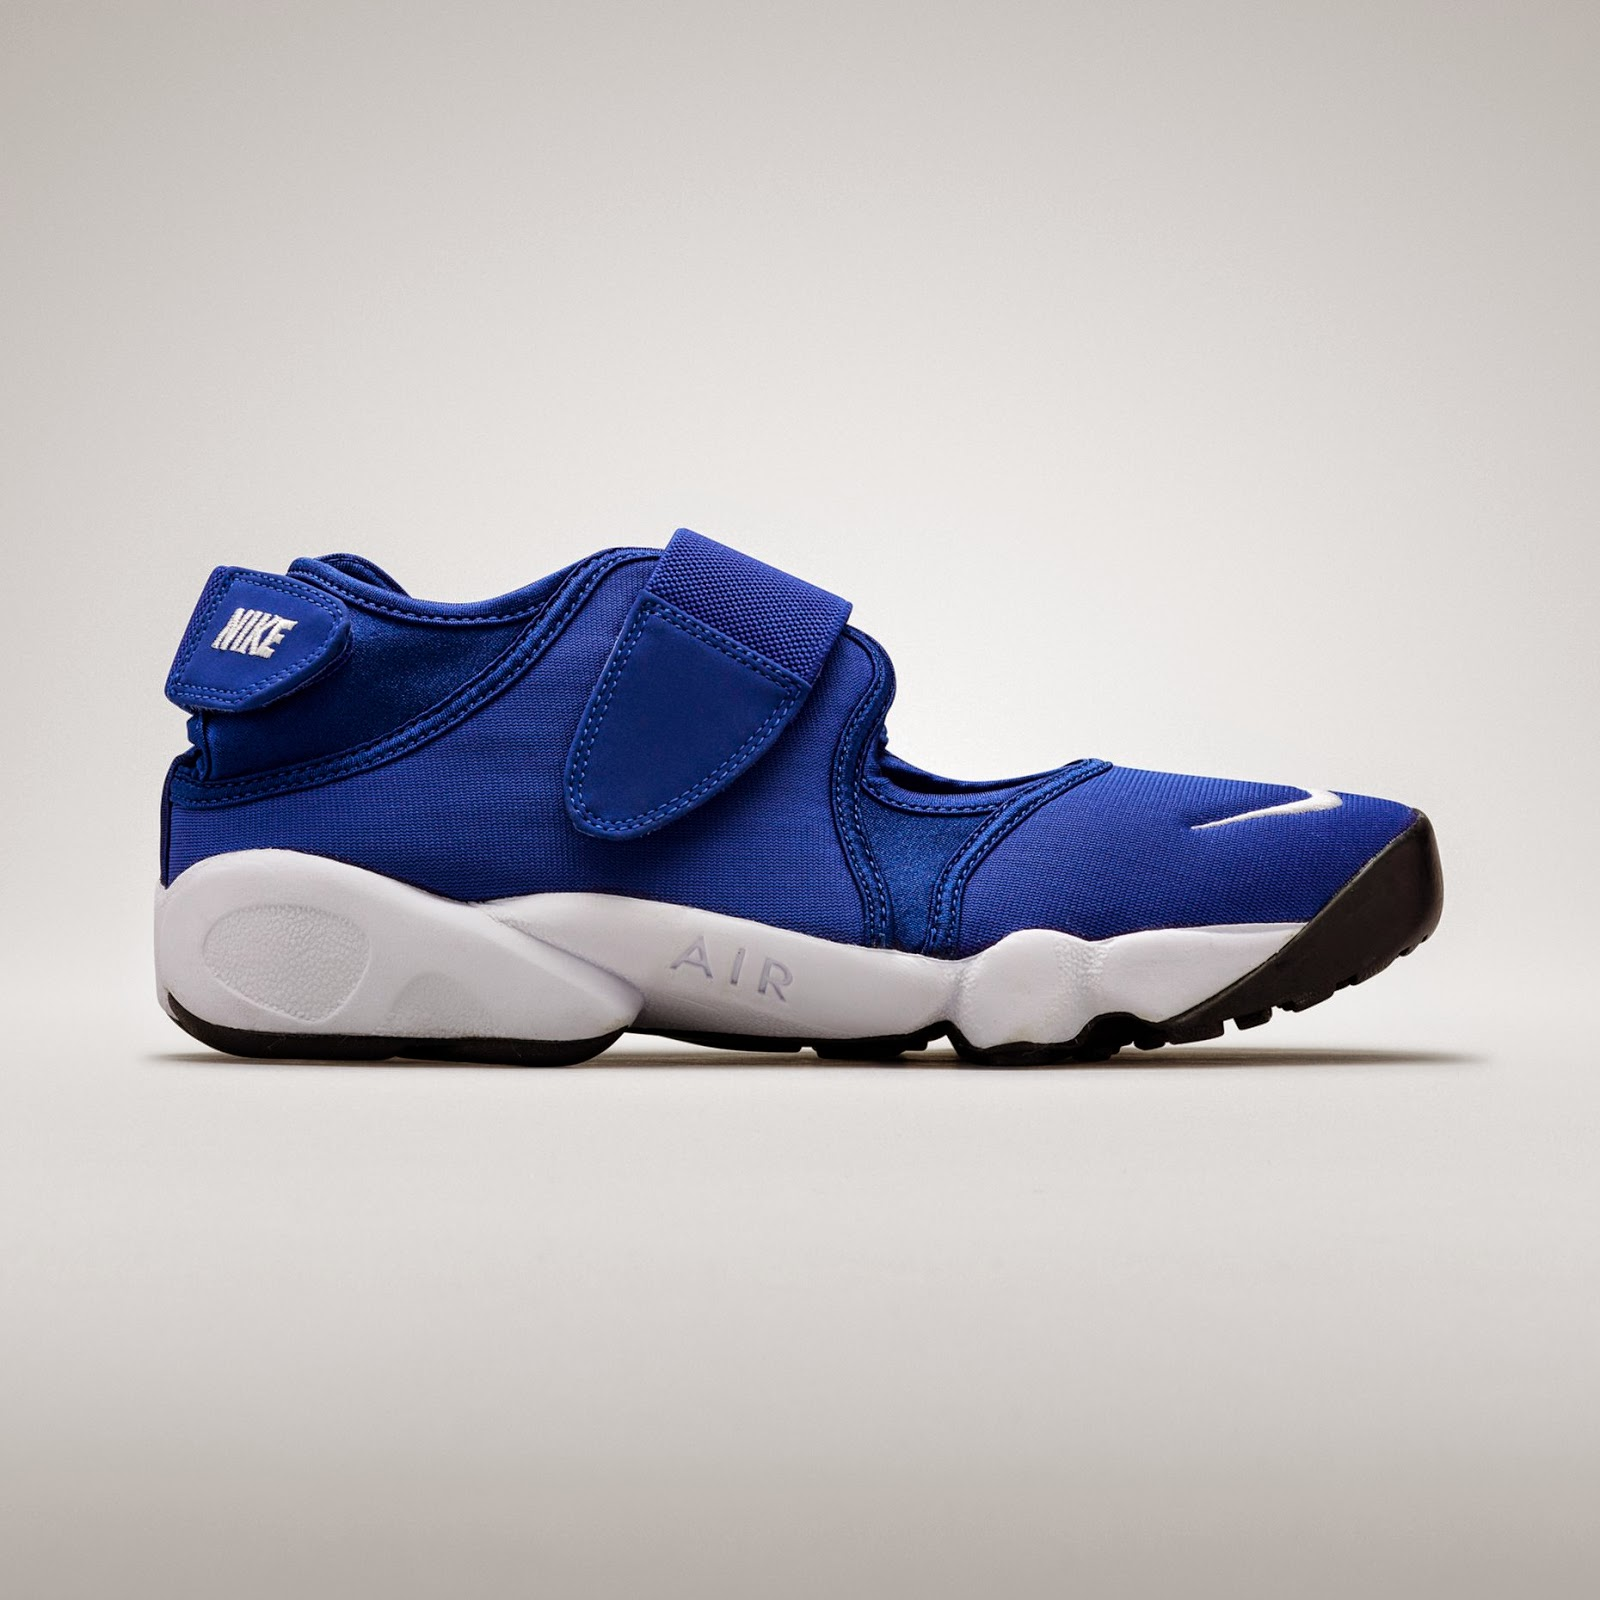 Orteil Nike Orteil Separe Chaussure Chaussure vmwON8n0